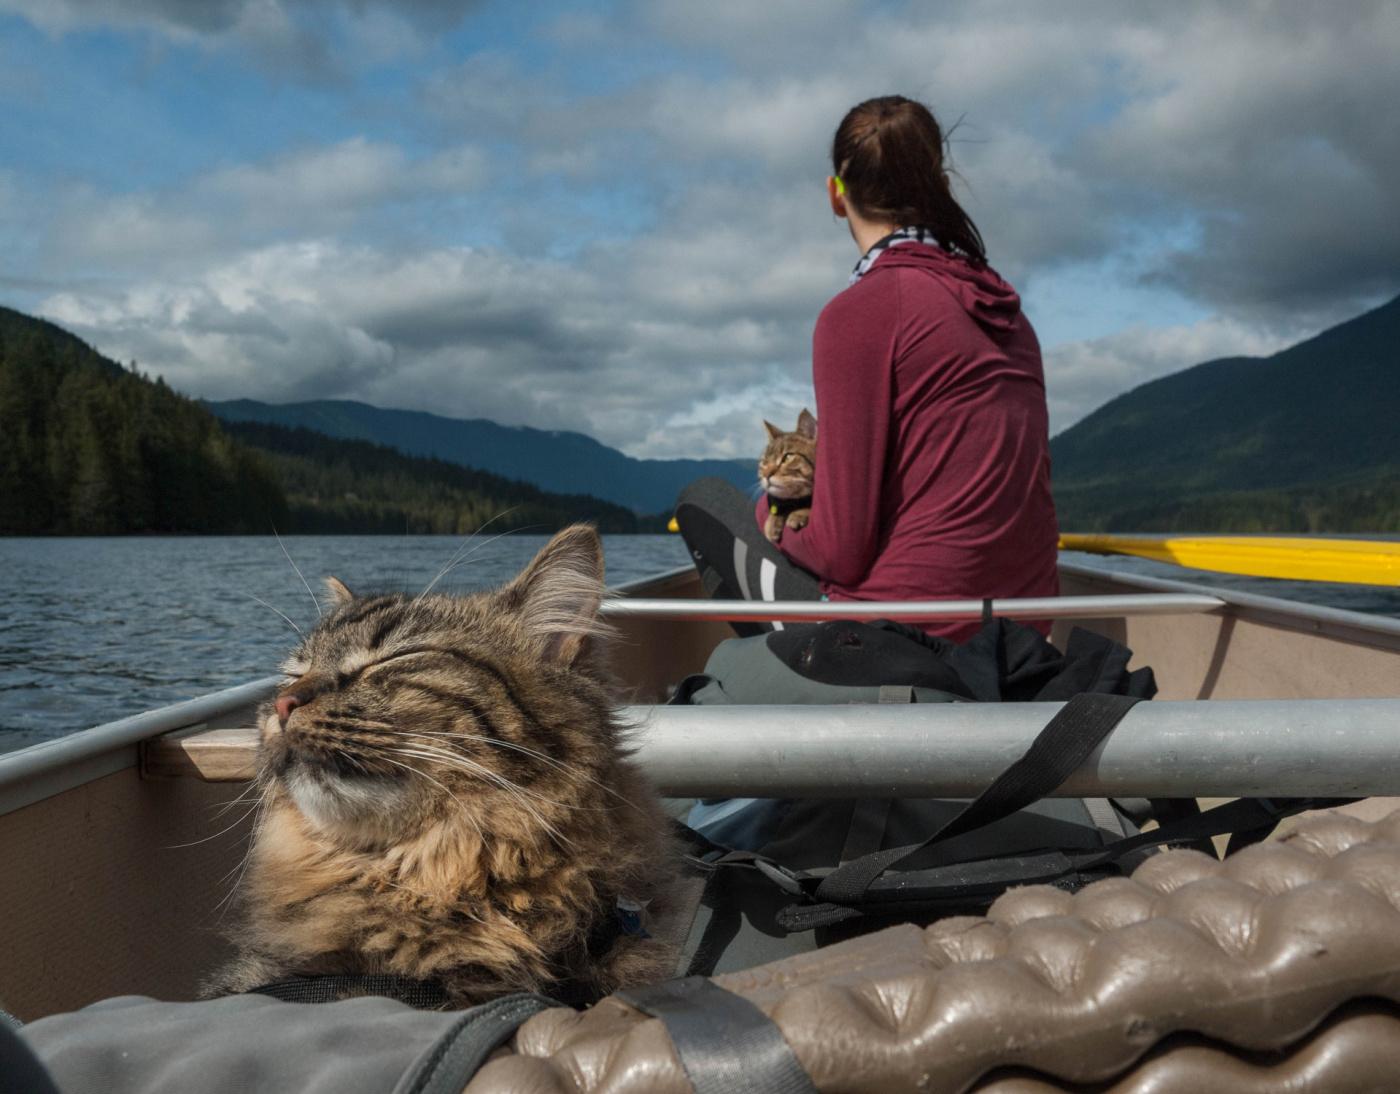 Adventure cats enjoying a boat ride